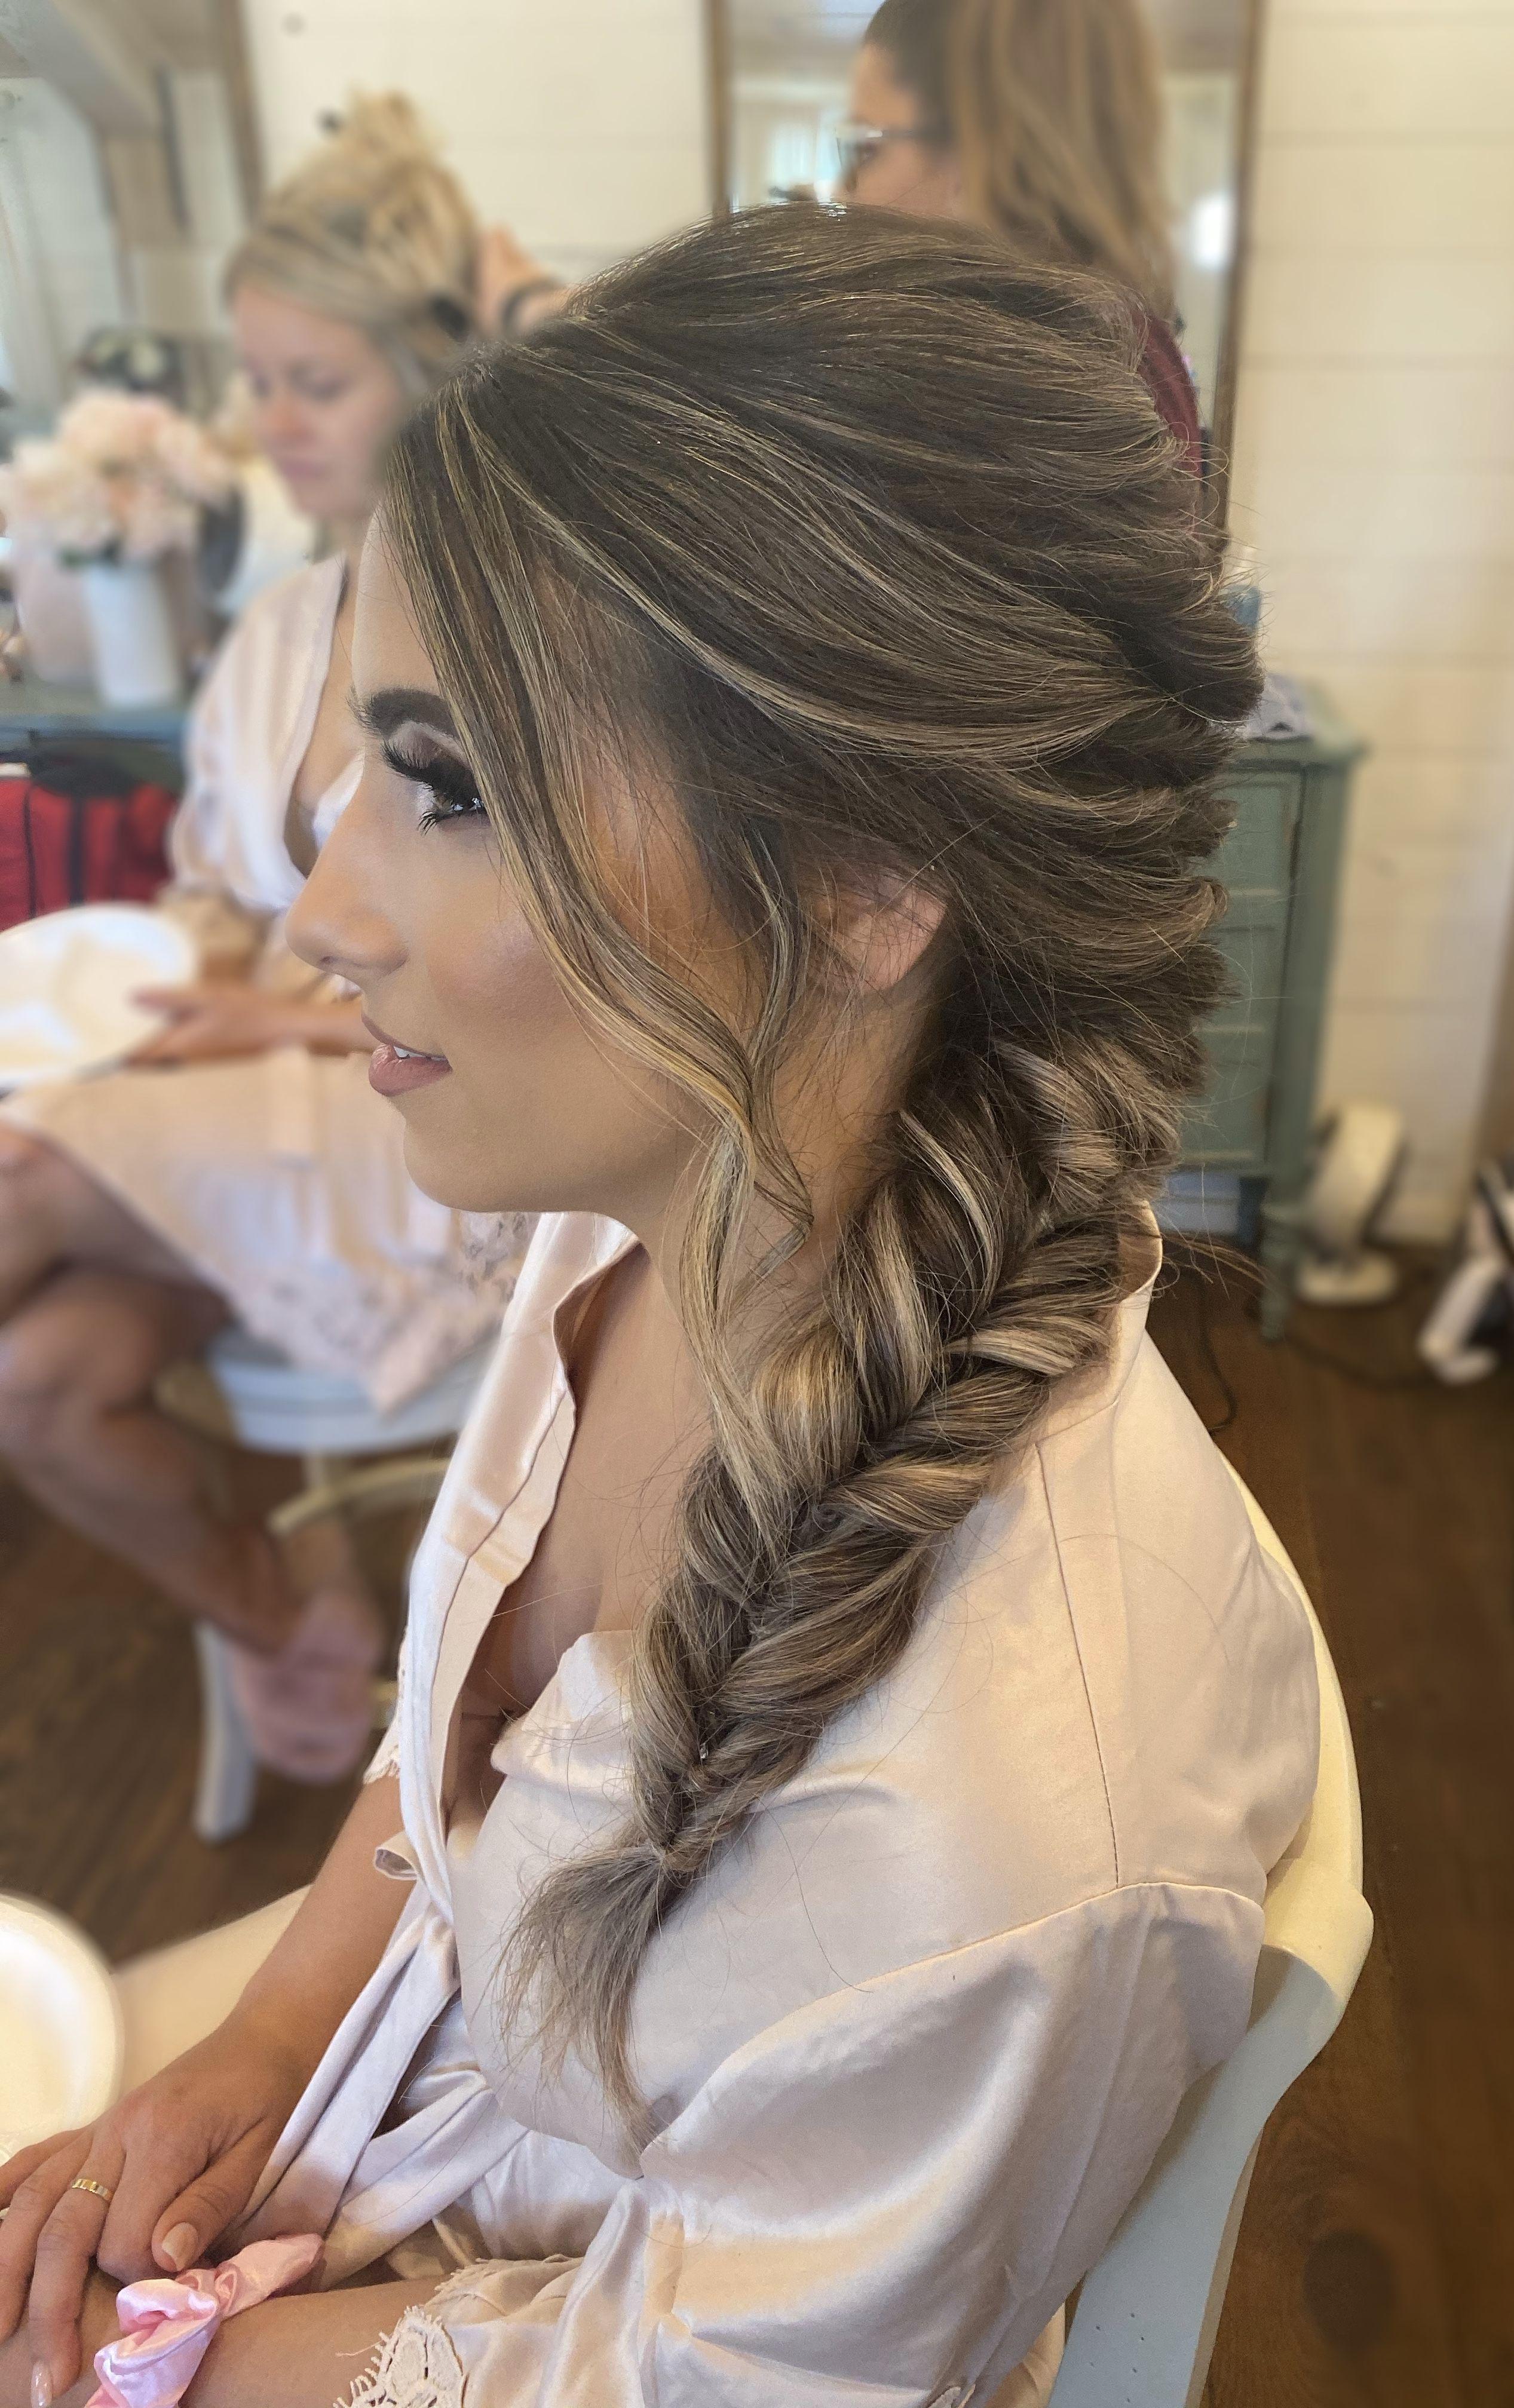 Wedding Hairstyle In 2020 Bridesmaid Hair Braid Bridesmaid Hair Braided Hairstyles For Wedding